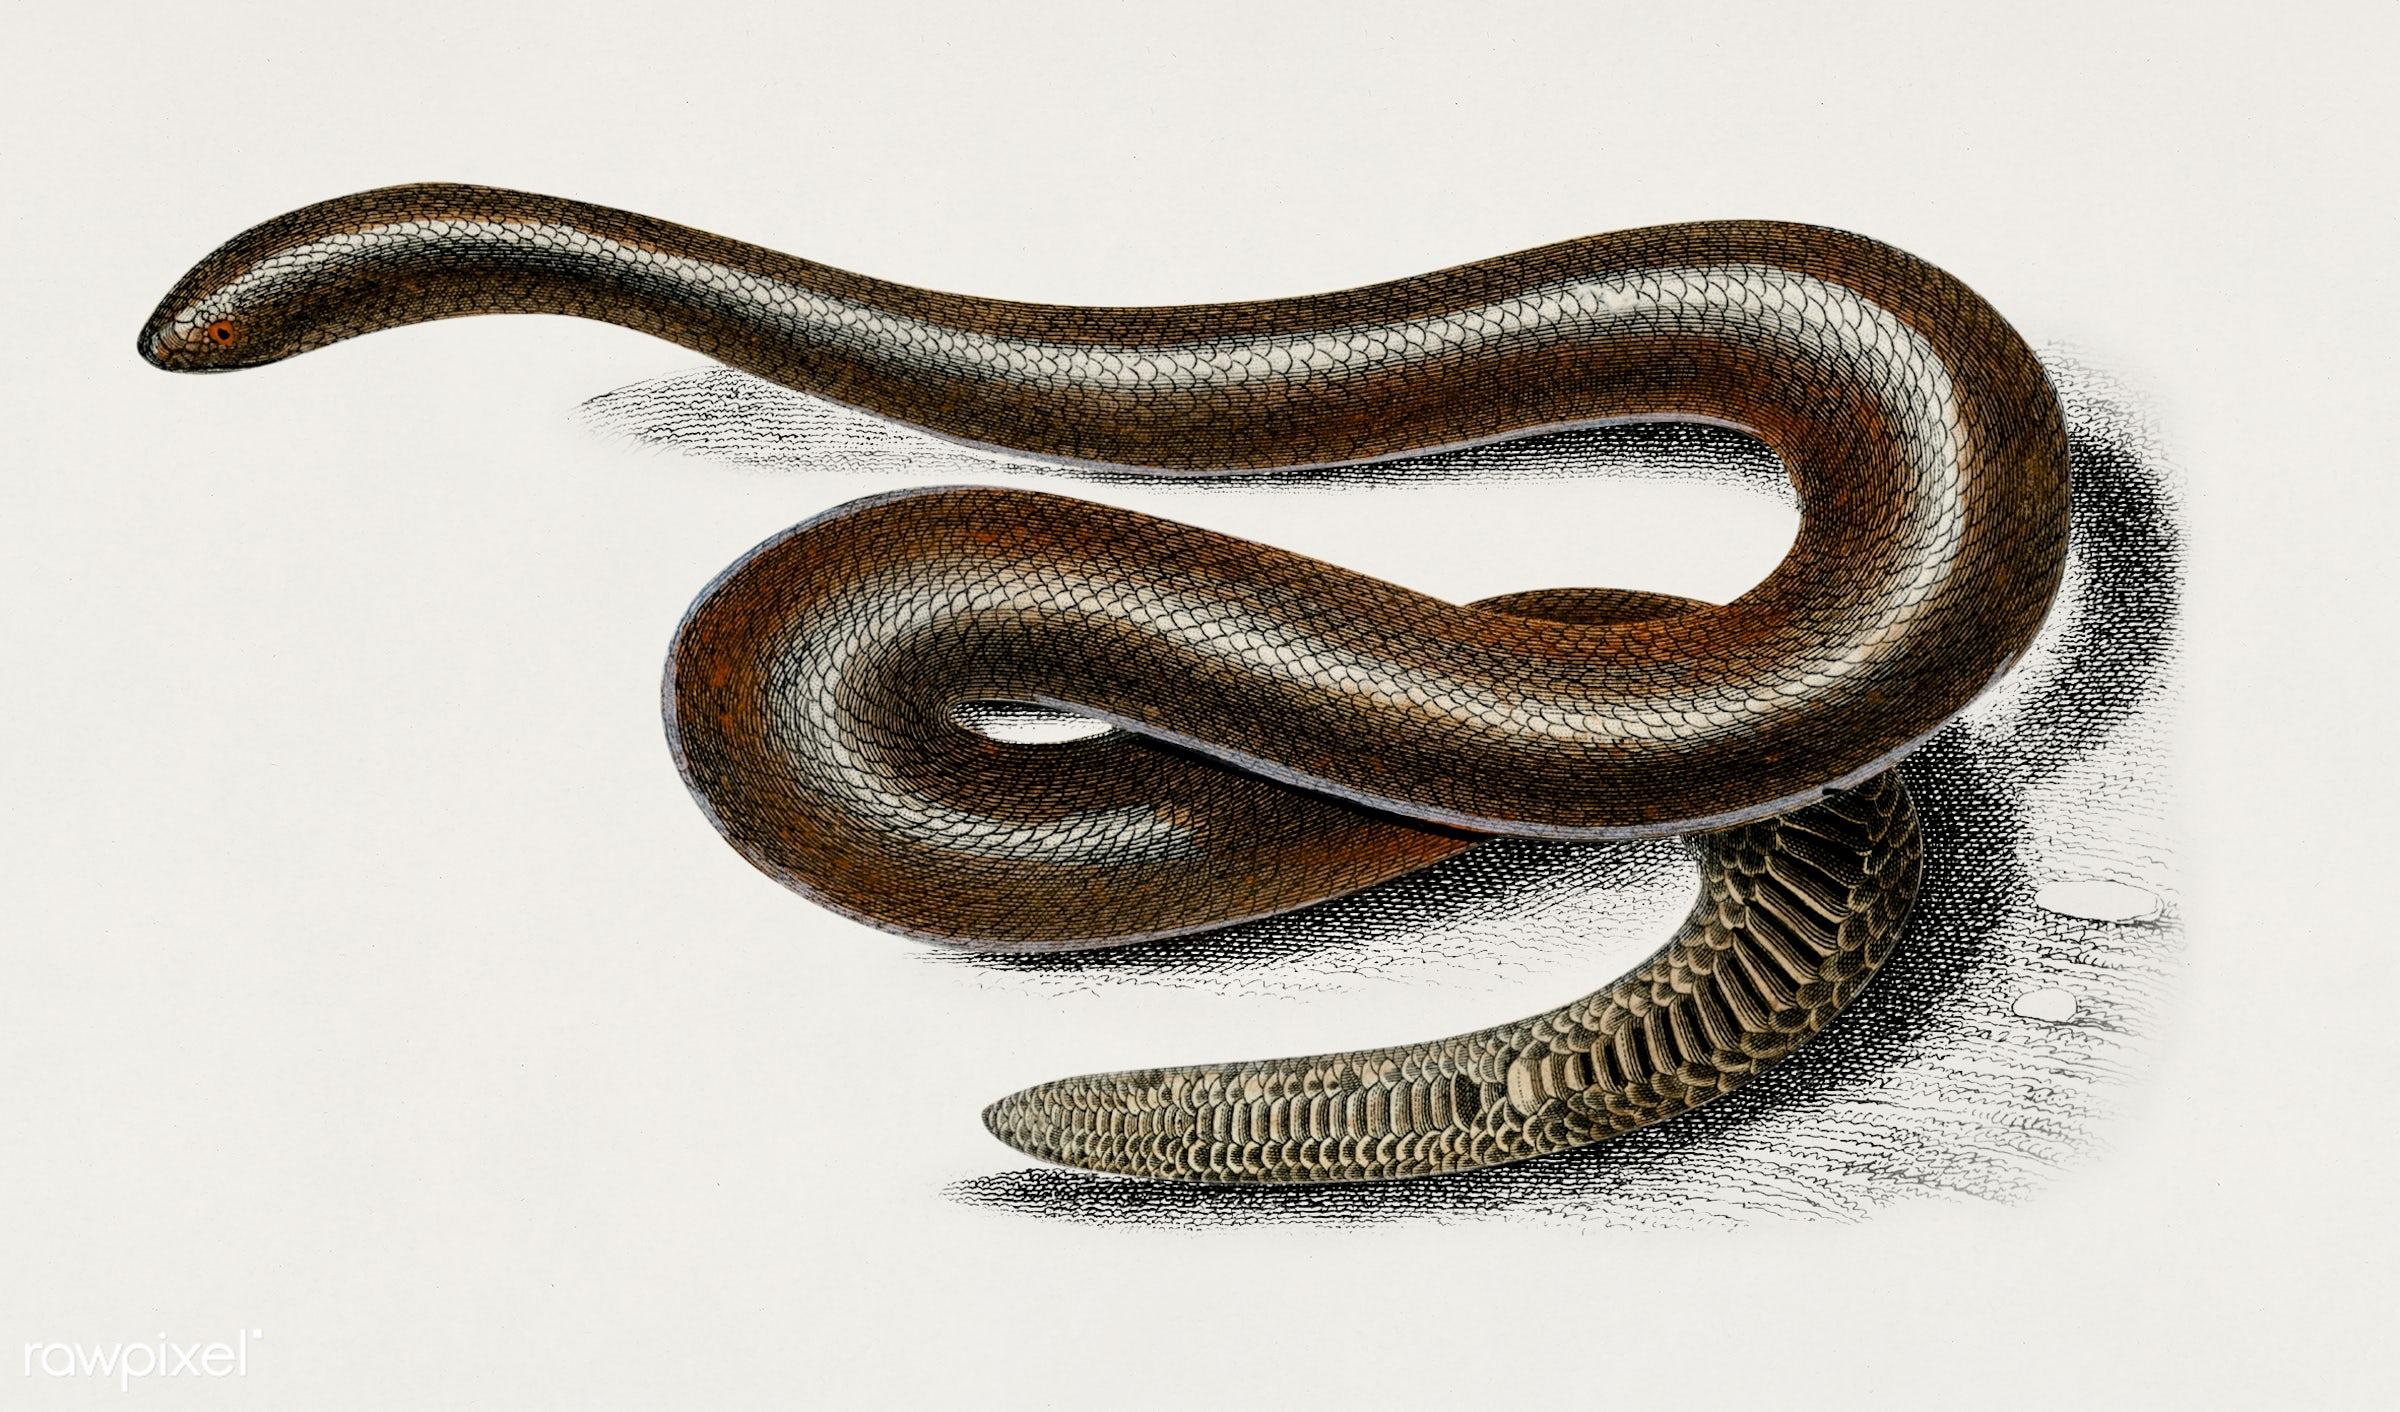 Eryx (Eryx Duvaucelii) illustrated by Charles Dessalines D' Orbigny (1806-1876). Digitally enhanced from our own 1892...